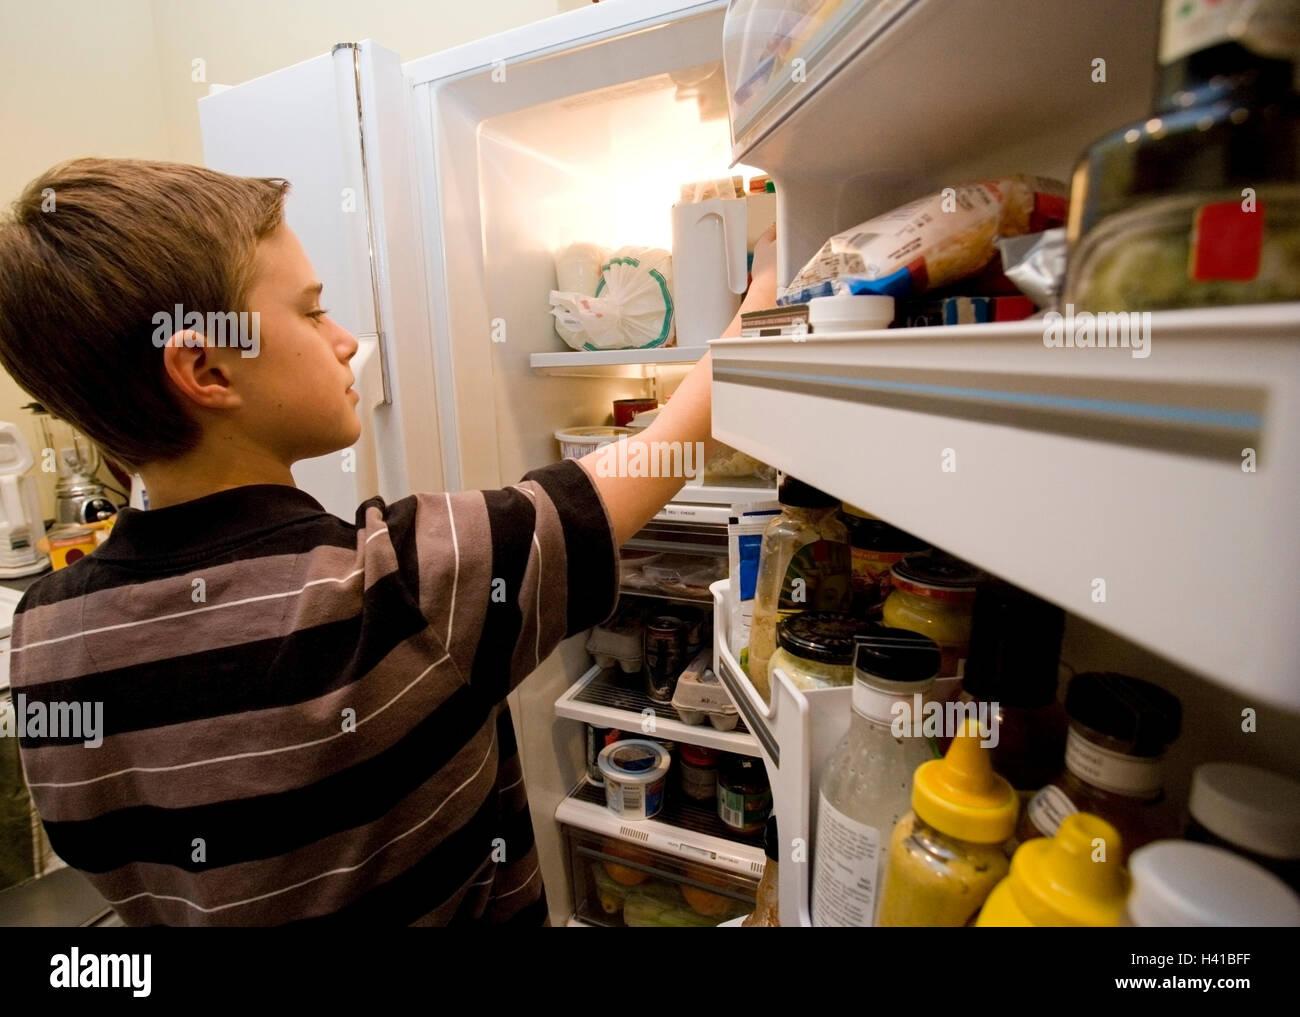 boy looking in refrigerator - Stock Image